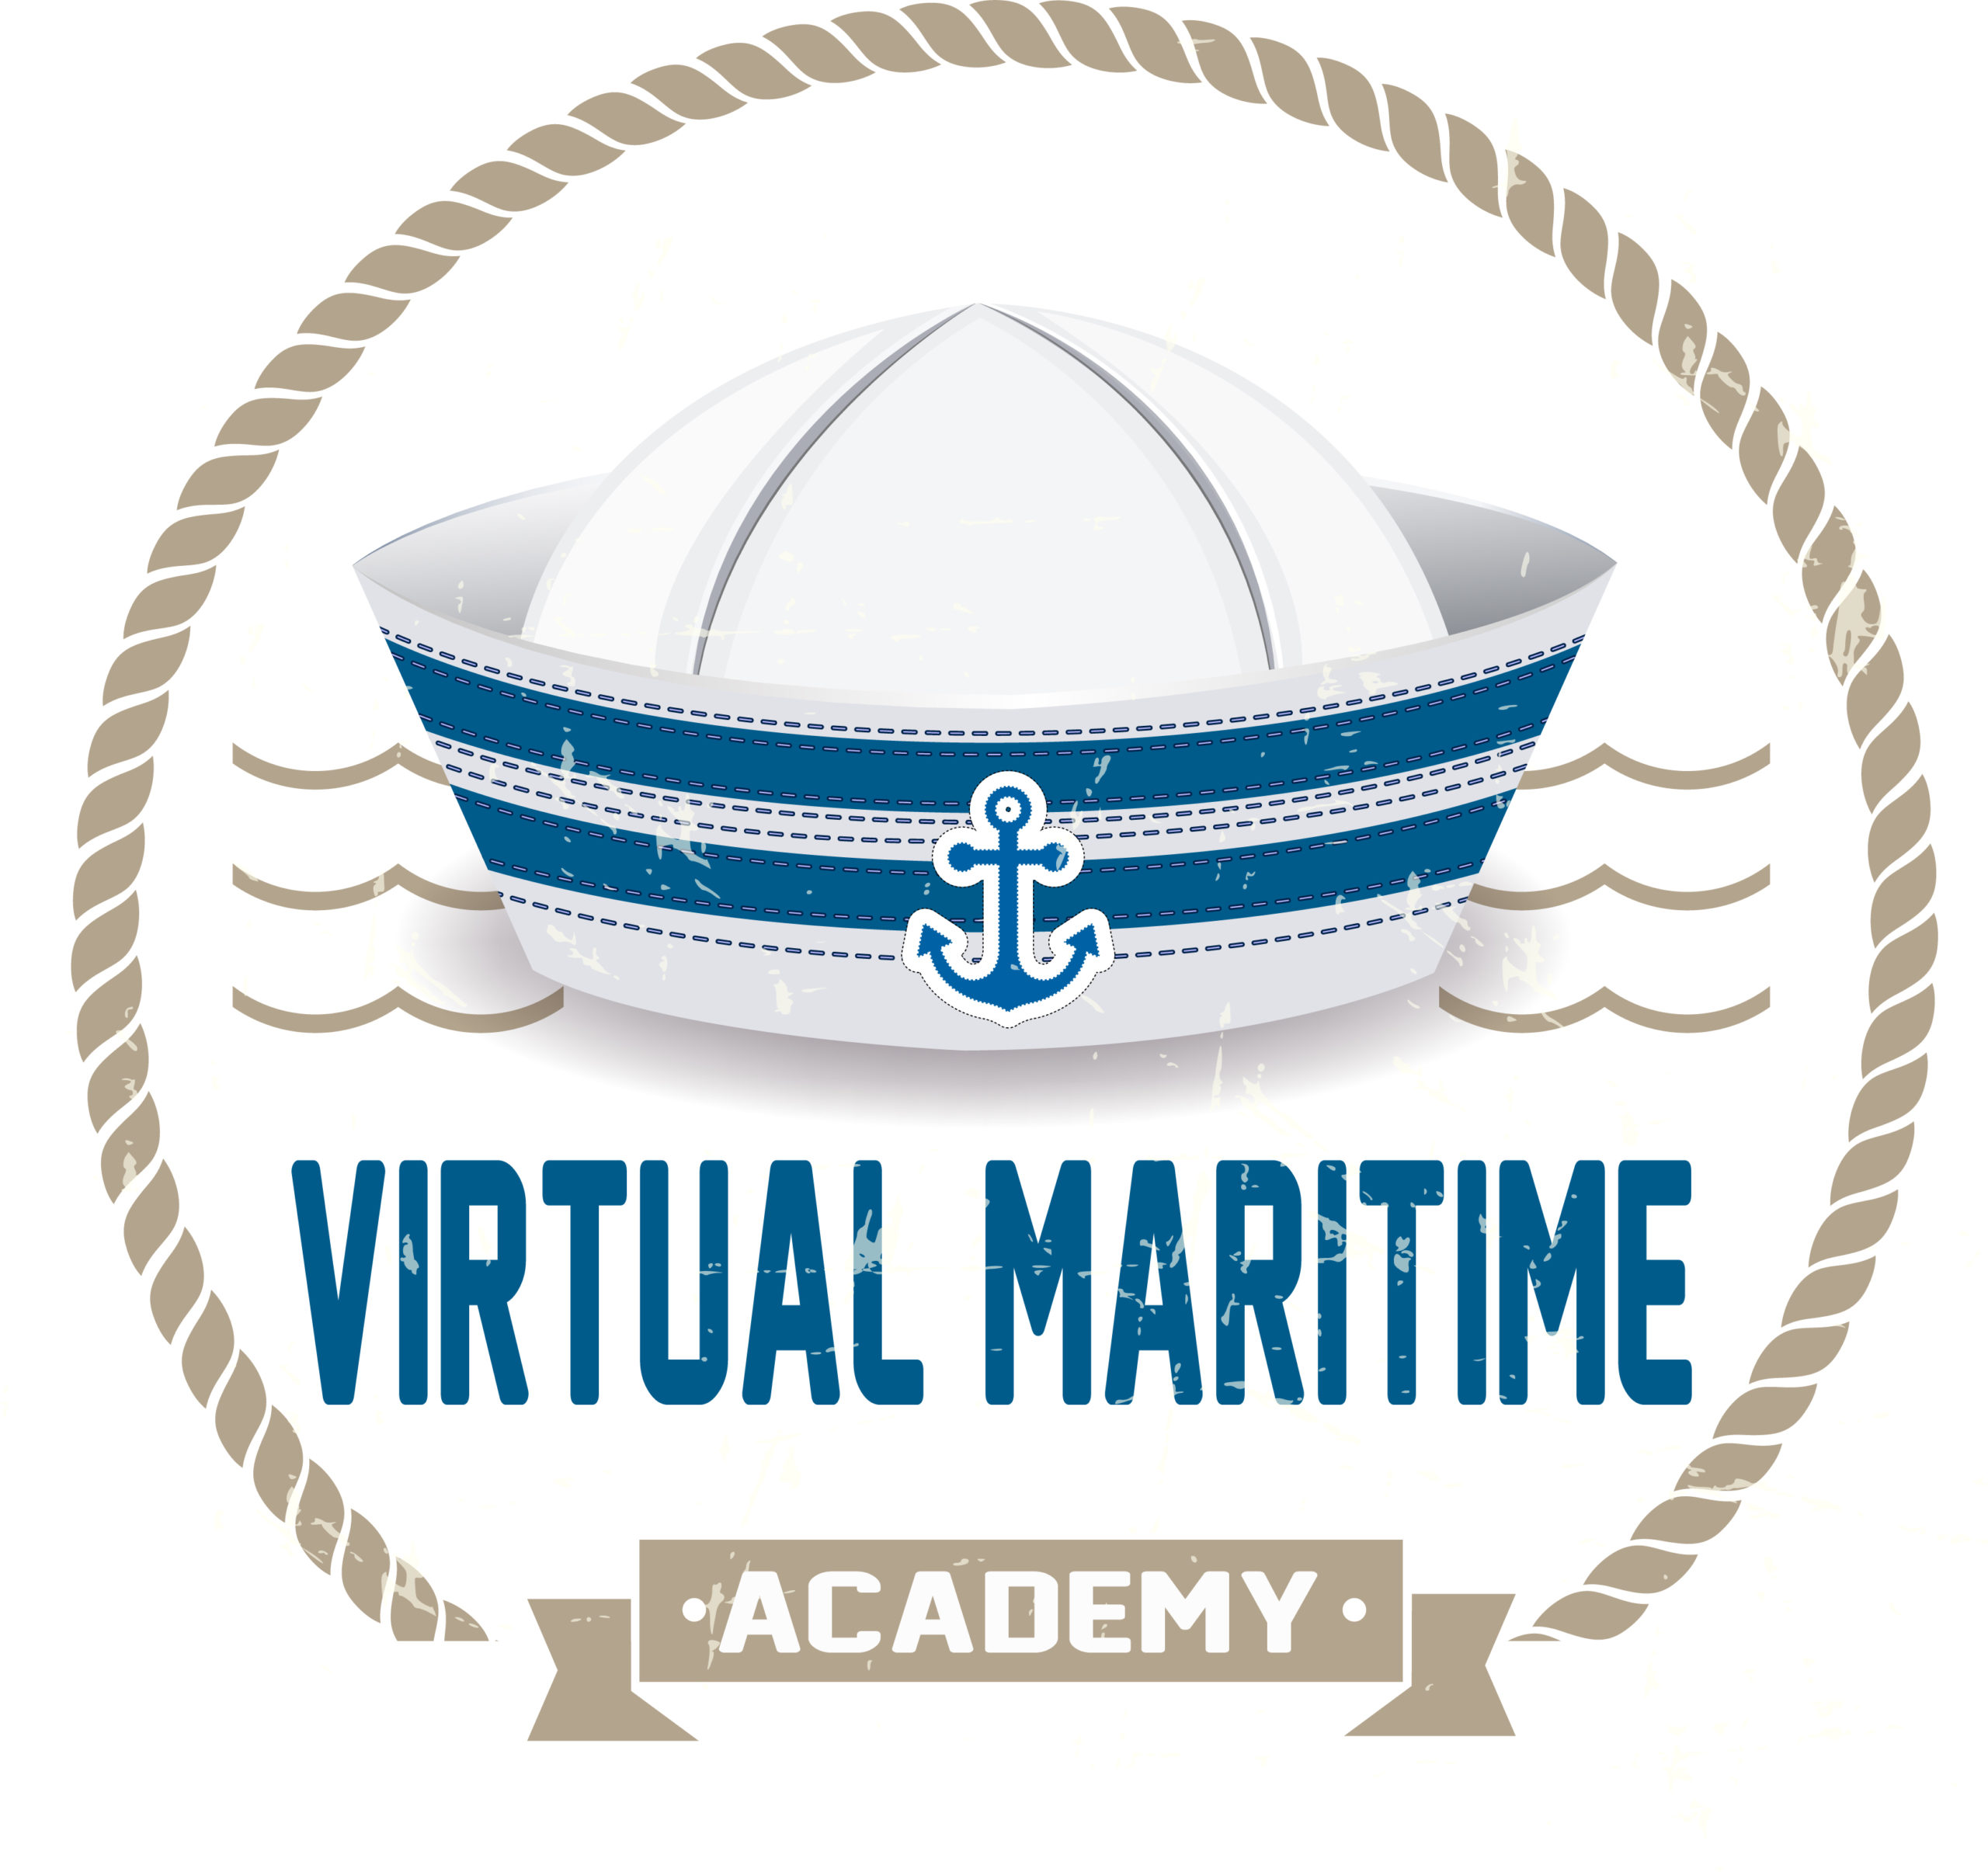 Virtual Maritime Academy